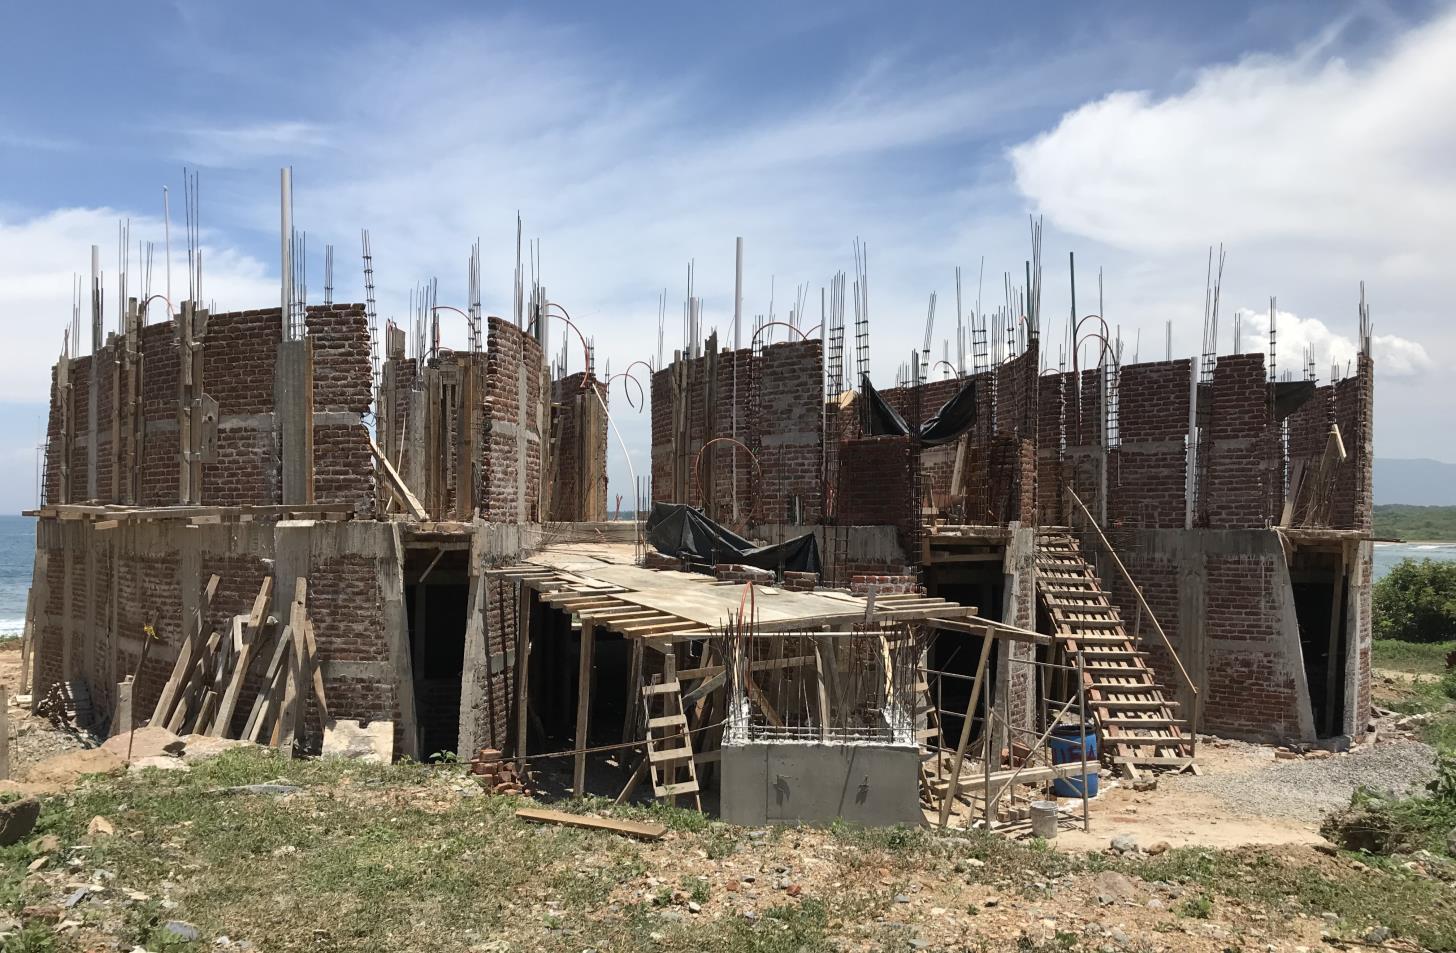 REPORTE-FOTOGRAFICO-PUNTA-MAJAHUA-12-DE-AGOSTO-DEL-2018-017.jpg